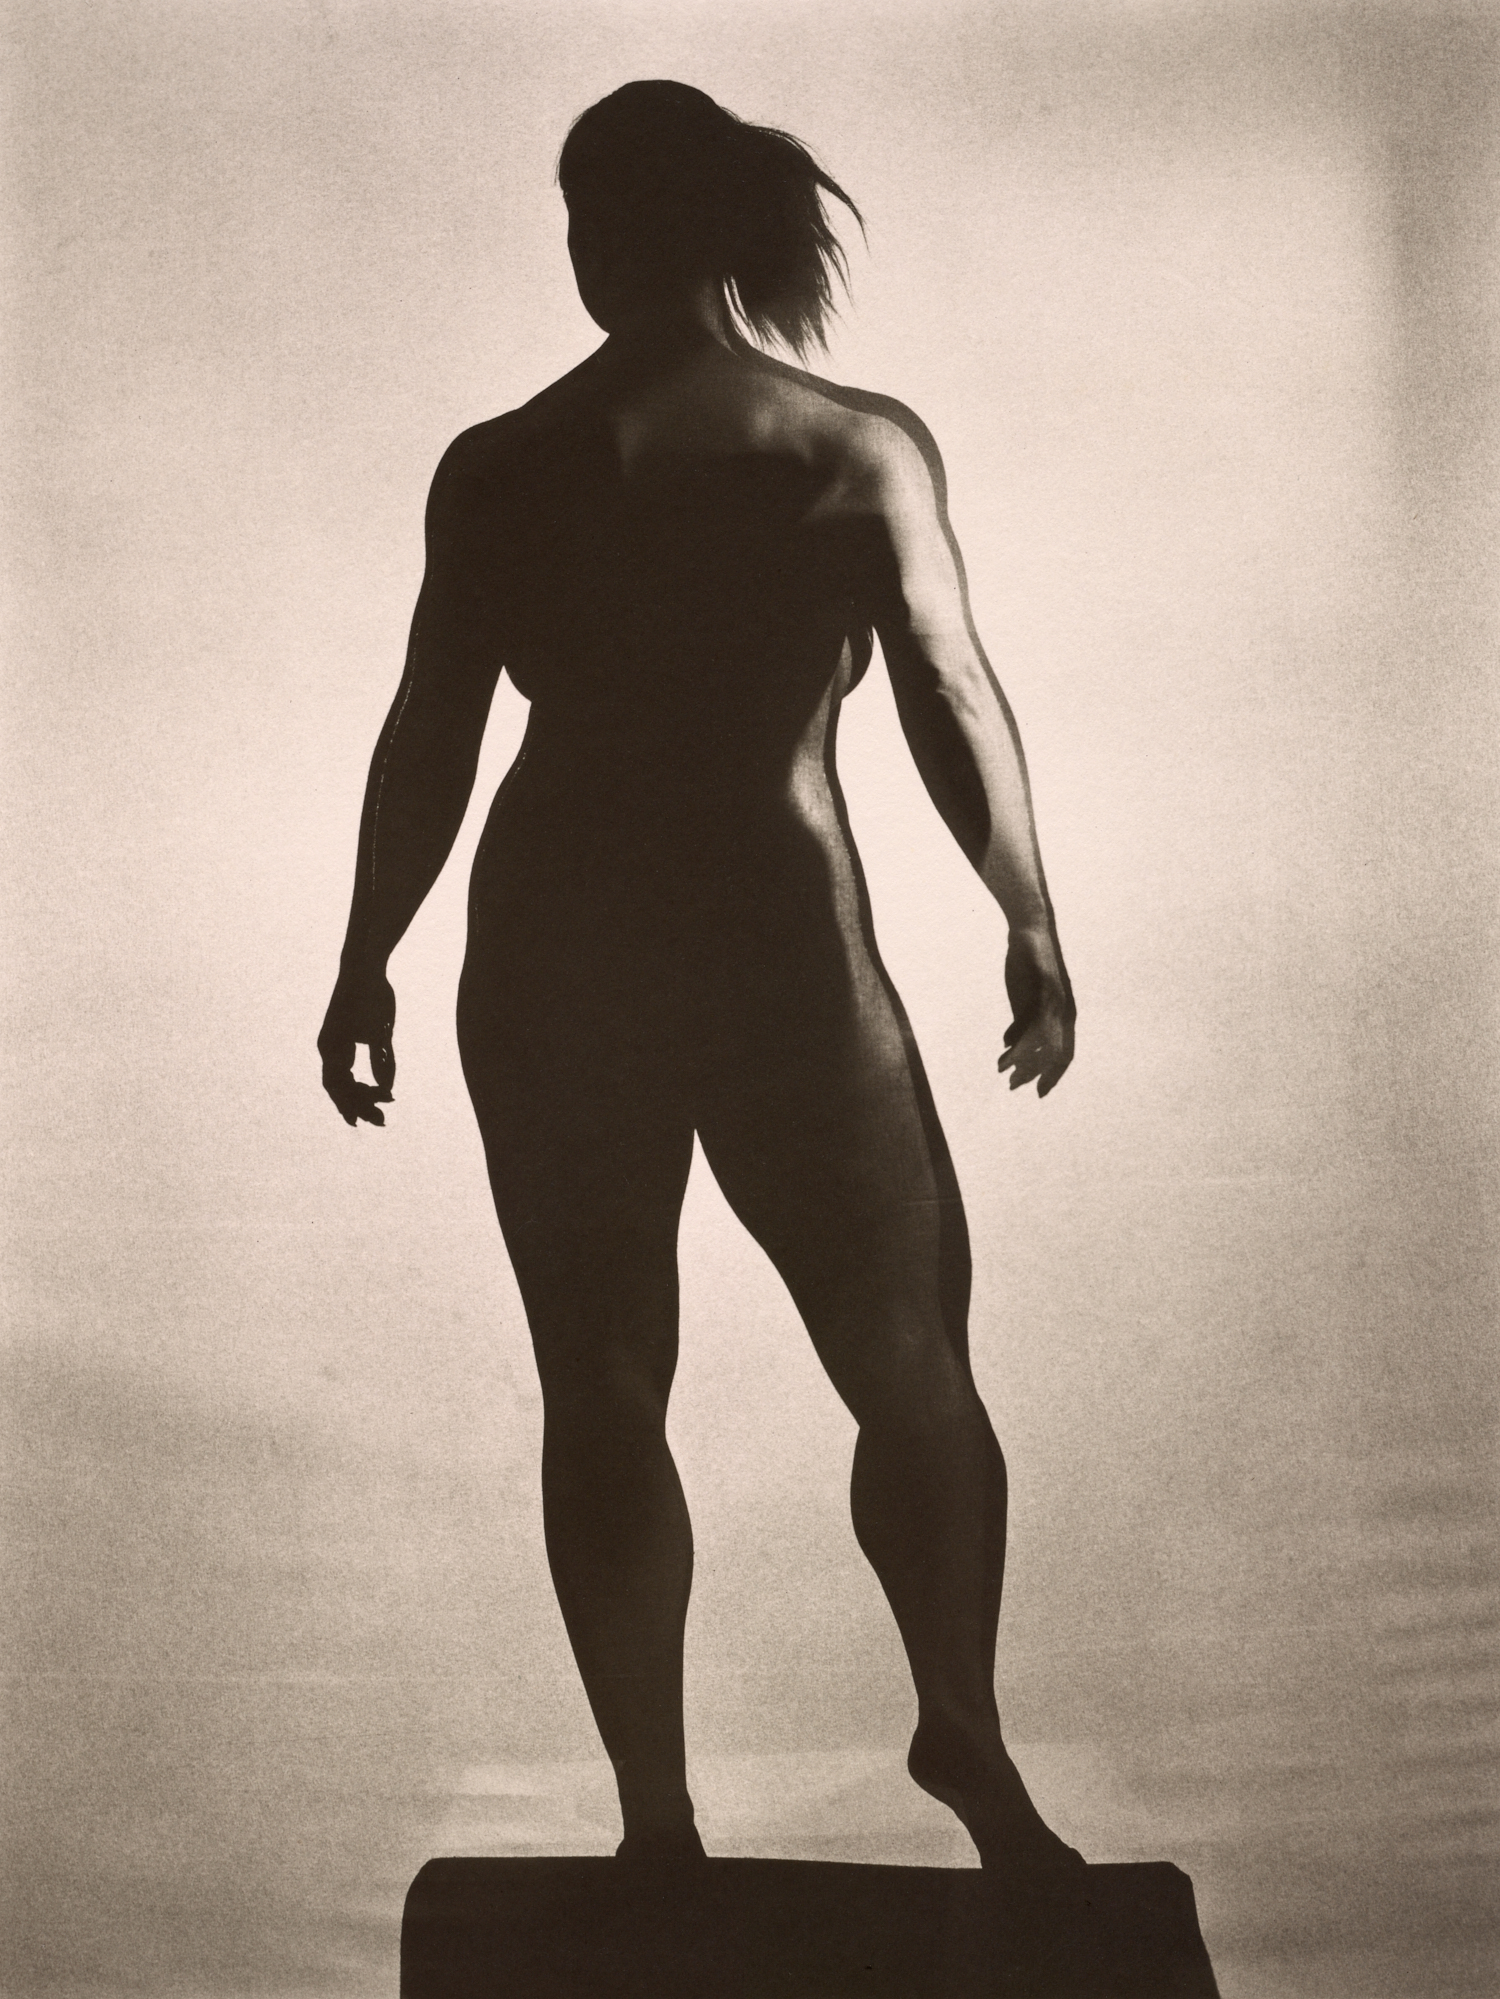 Large Woman (Nursel) , New York, 1997 Platinum-palladium print © Condé Nast